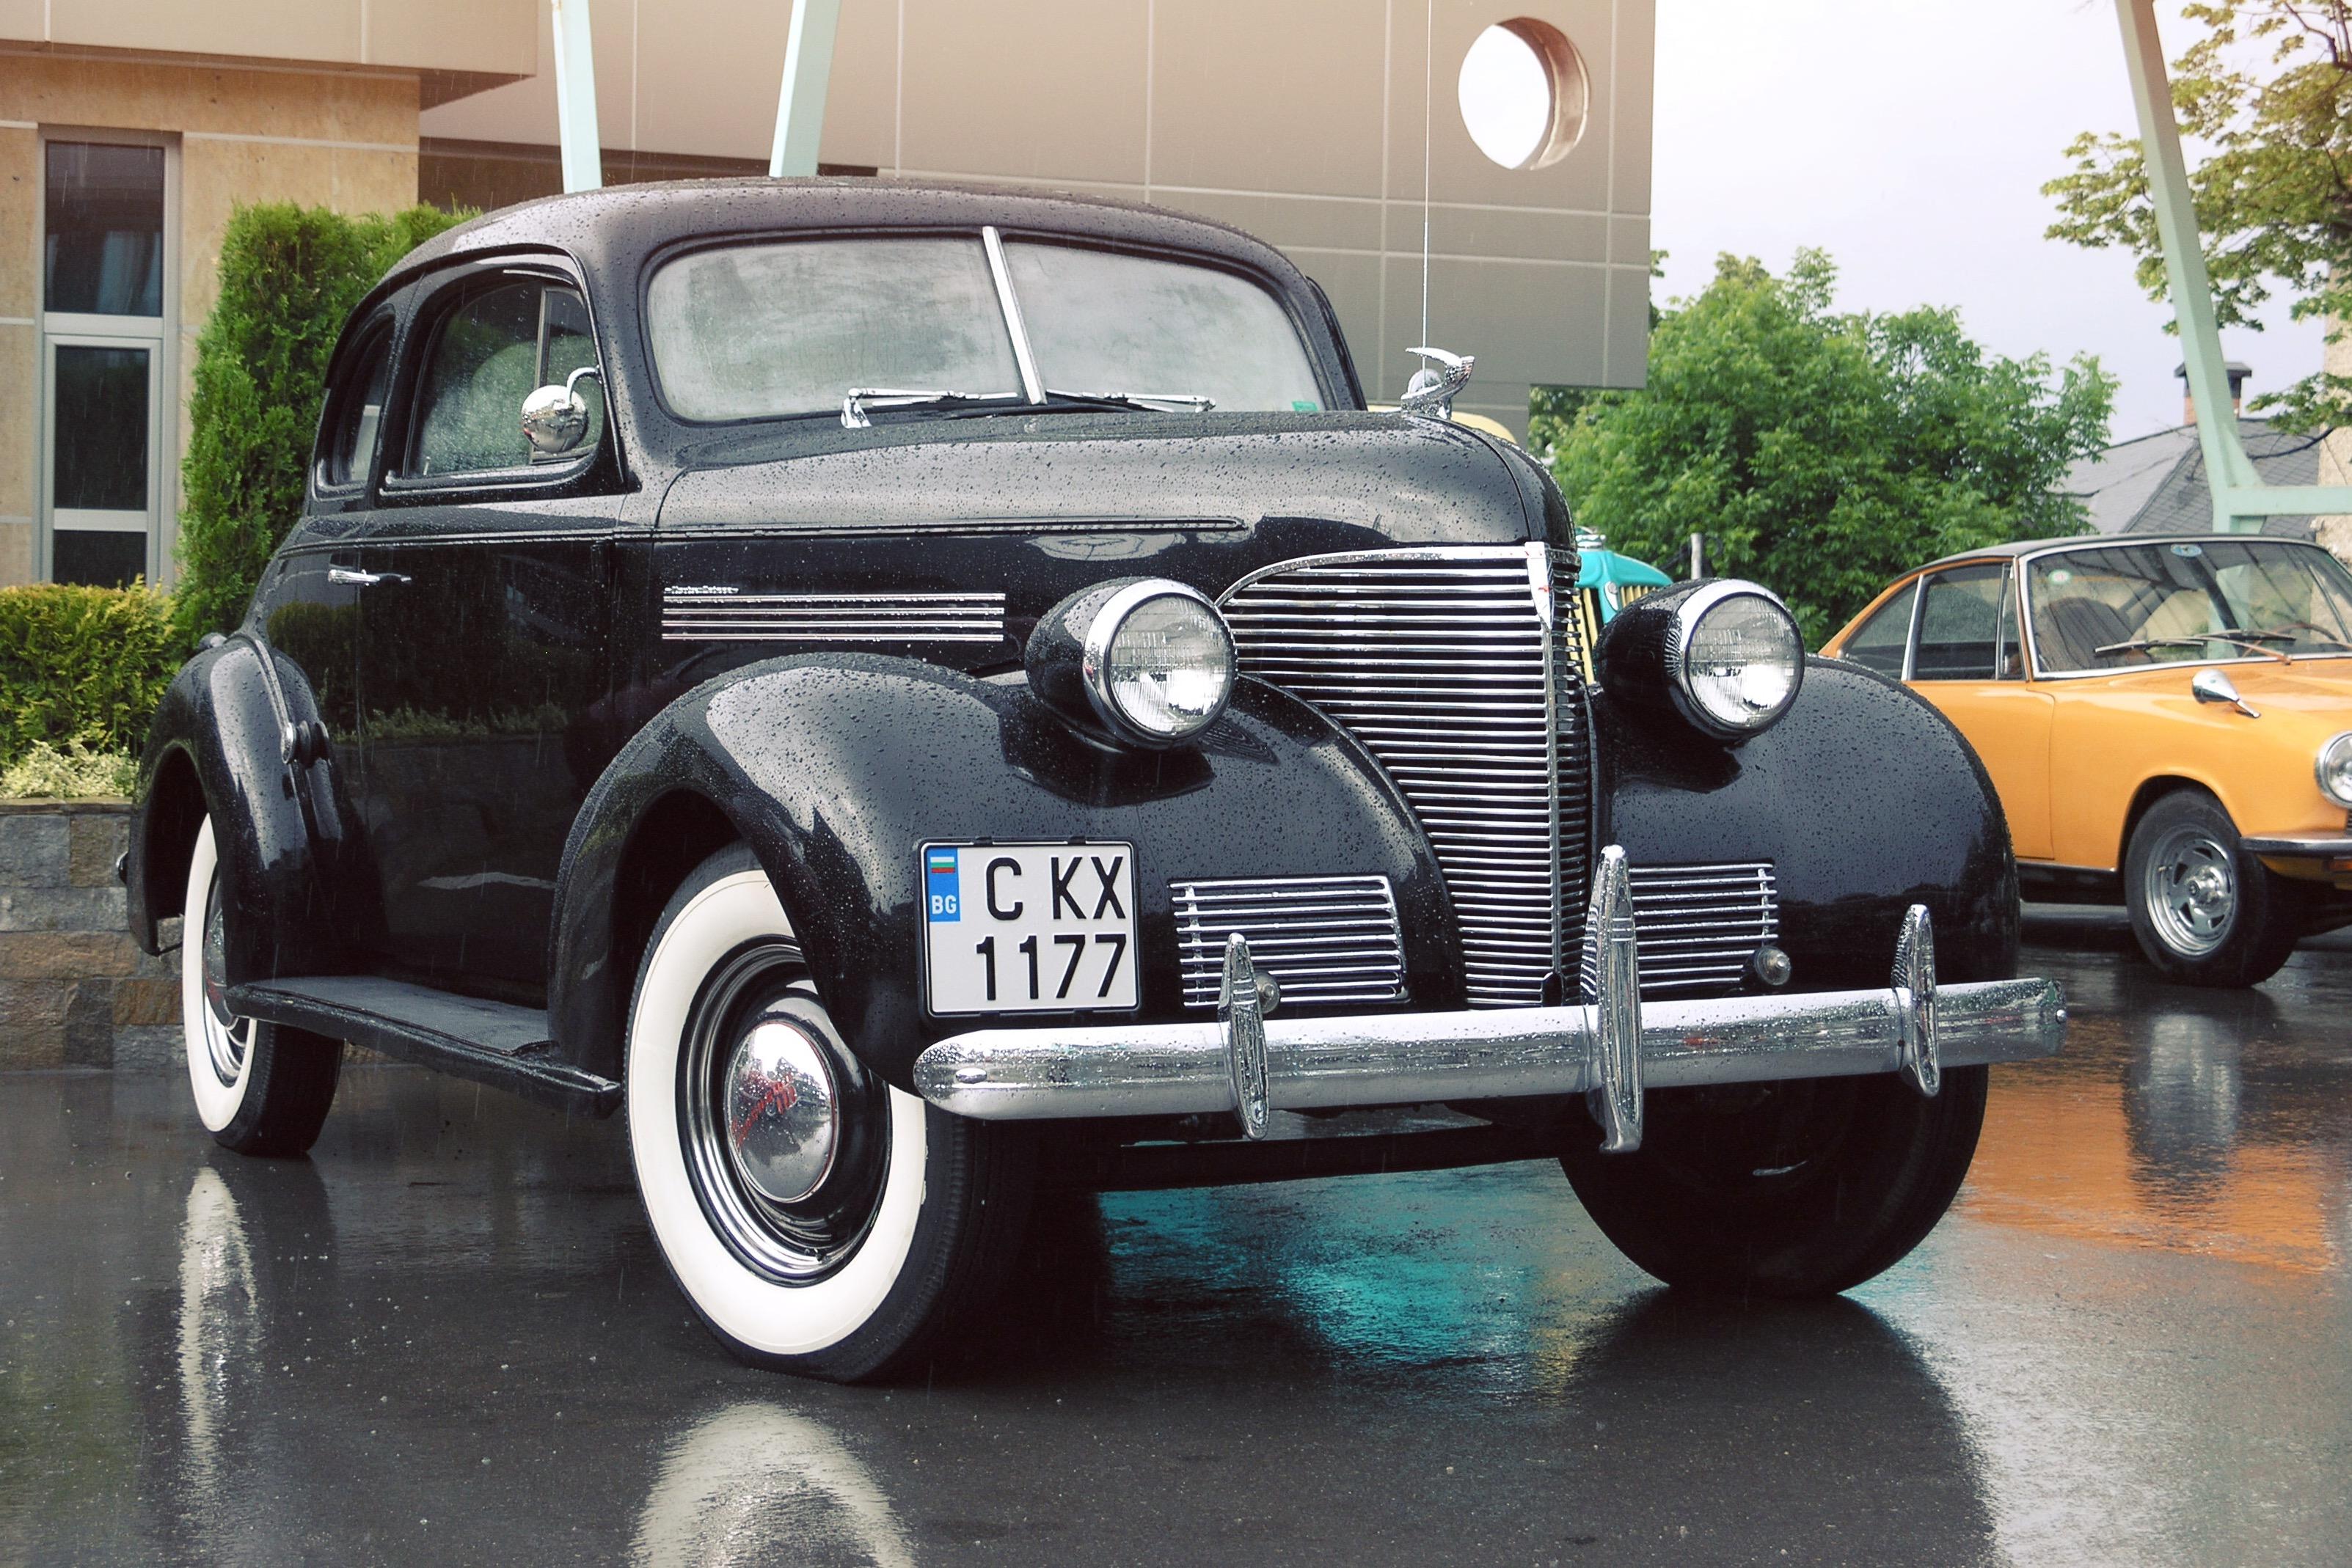 Wallpaper : old, vintage, Bulgaria, Vintage car, classic car ...